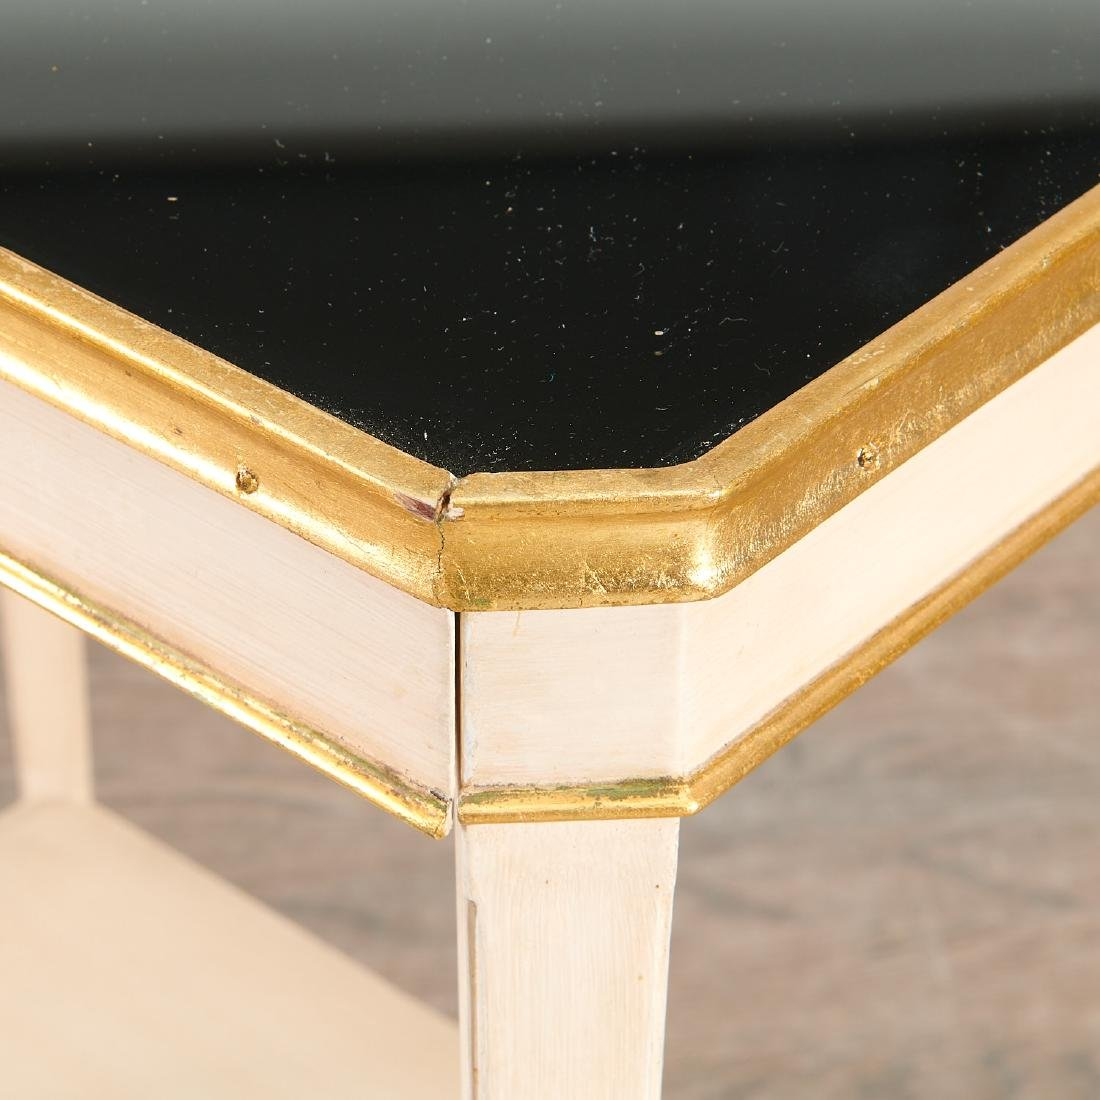 Fine Maison Jansen tiered side tables - 4